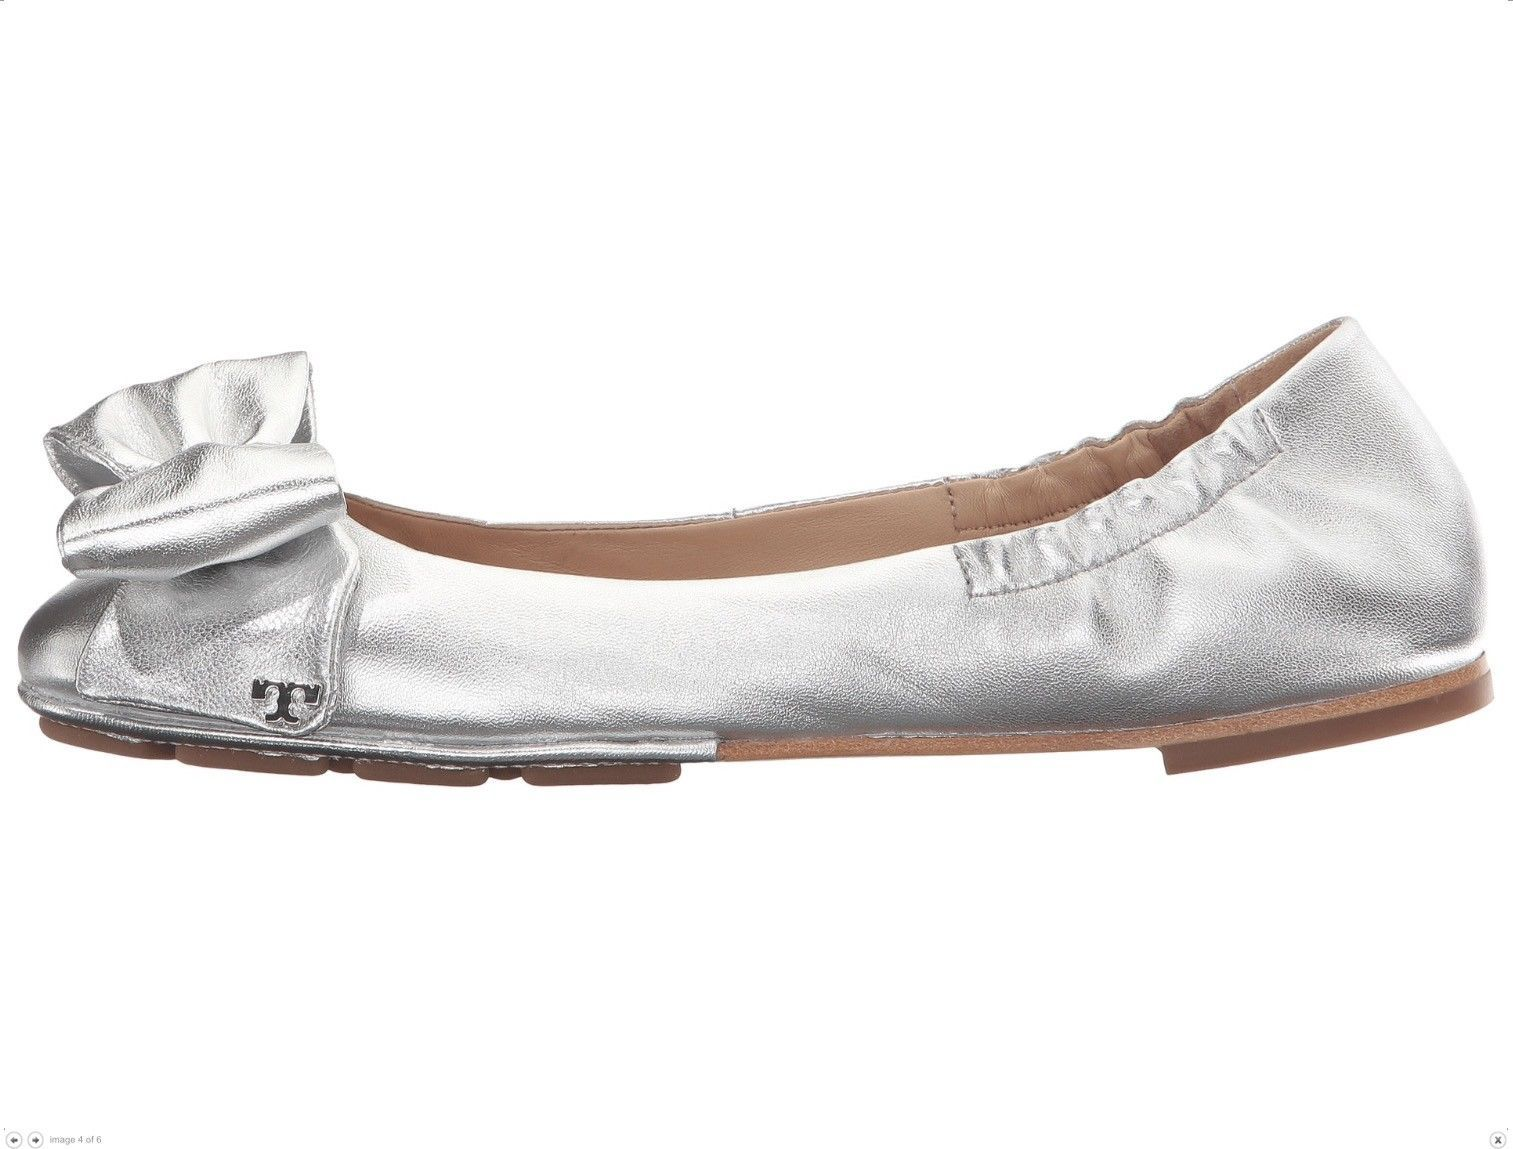 Tory Burch Divine Bow Driver Ballet Flats